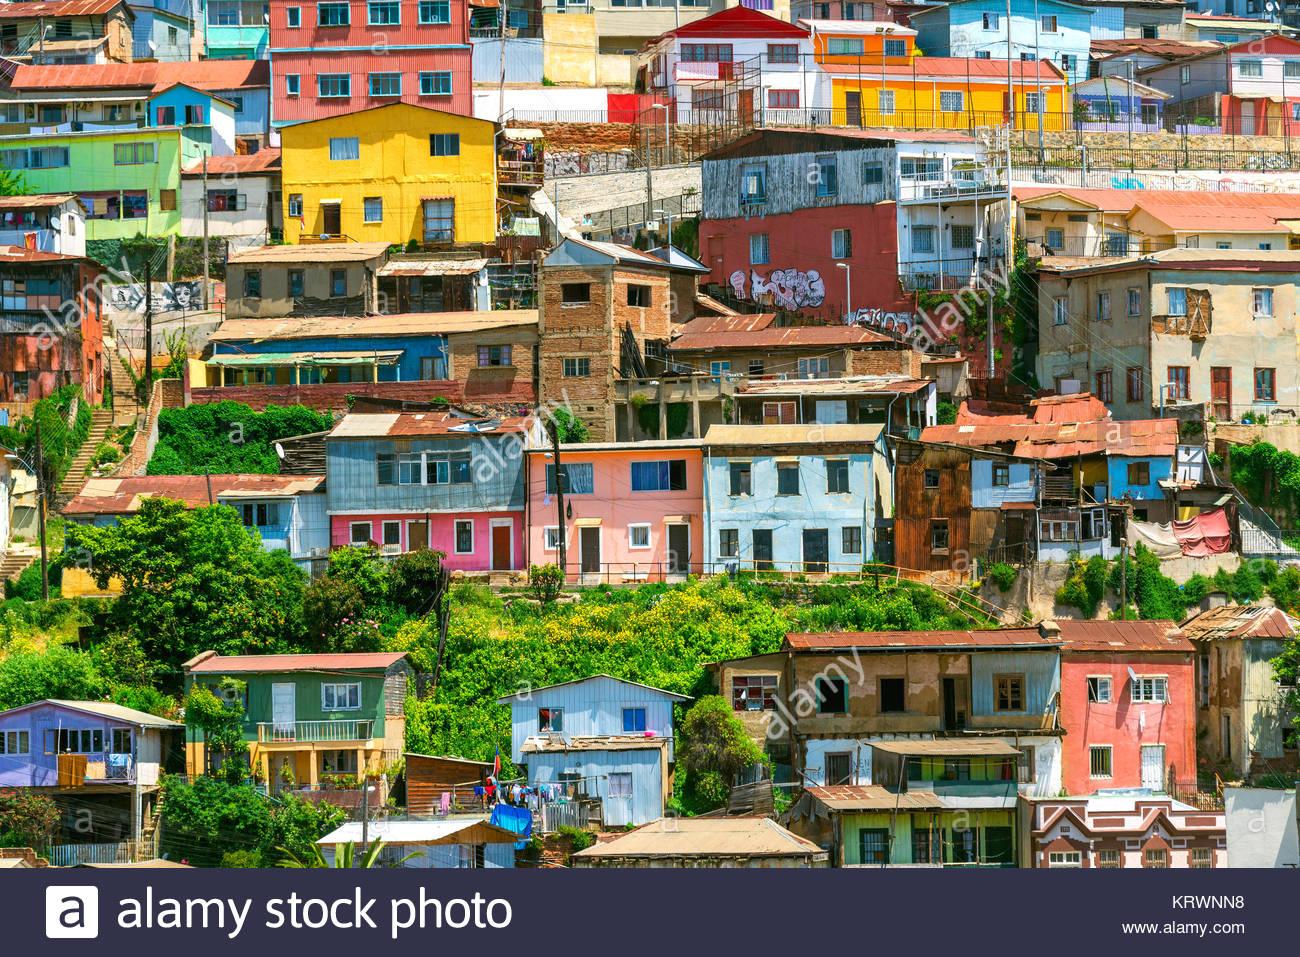 Colorful Houses of Valparaiso Stock Photo